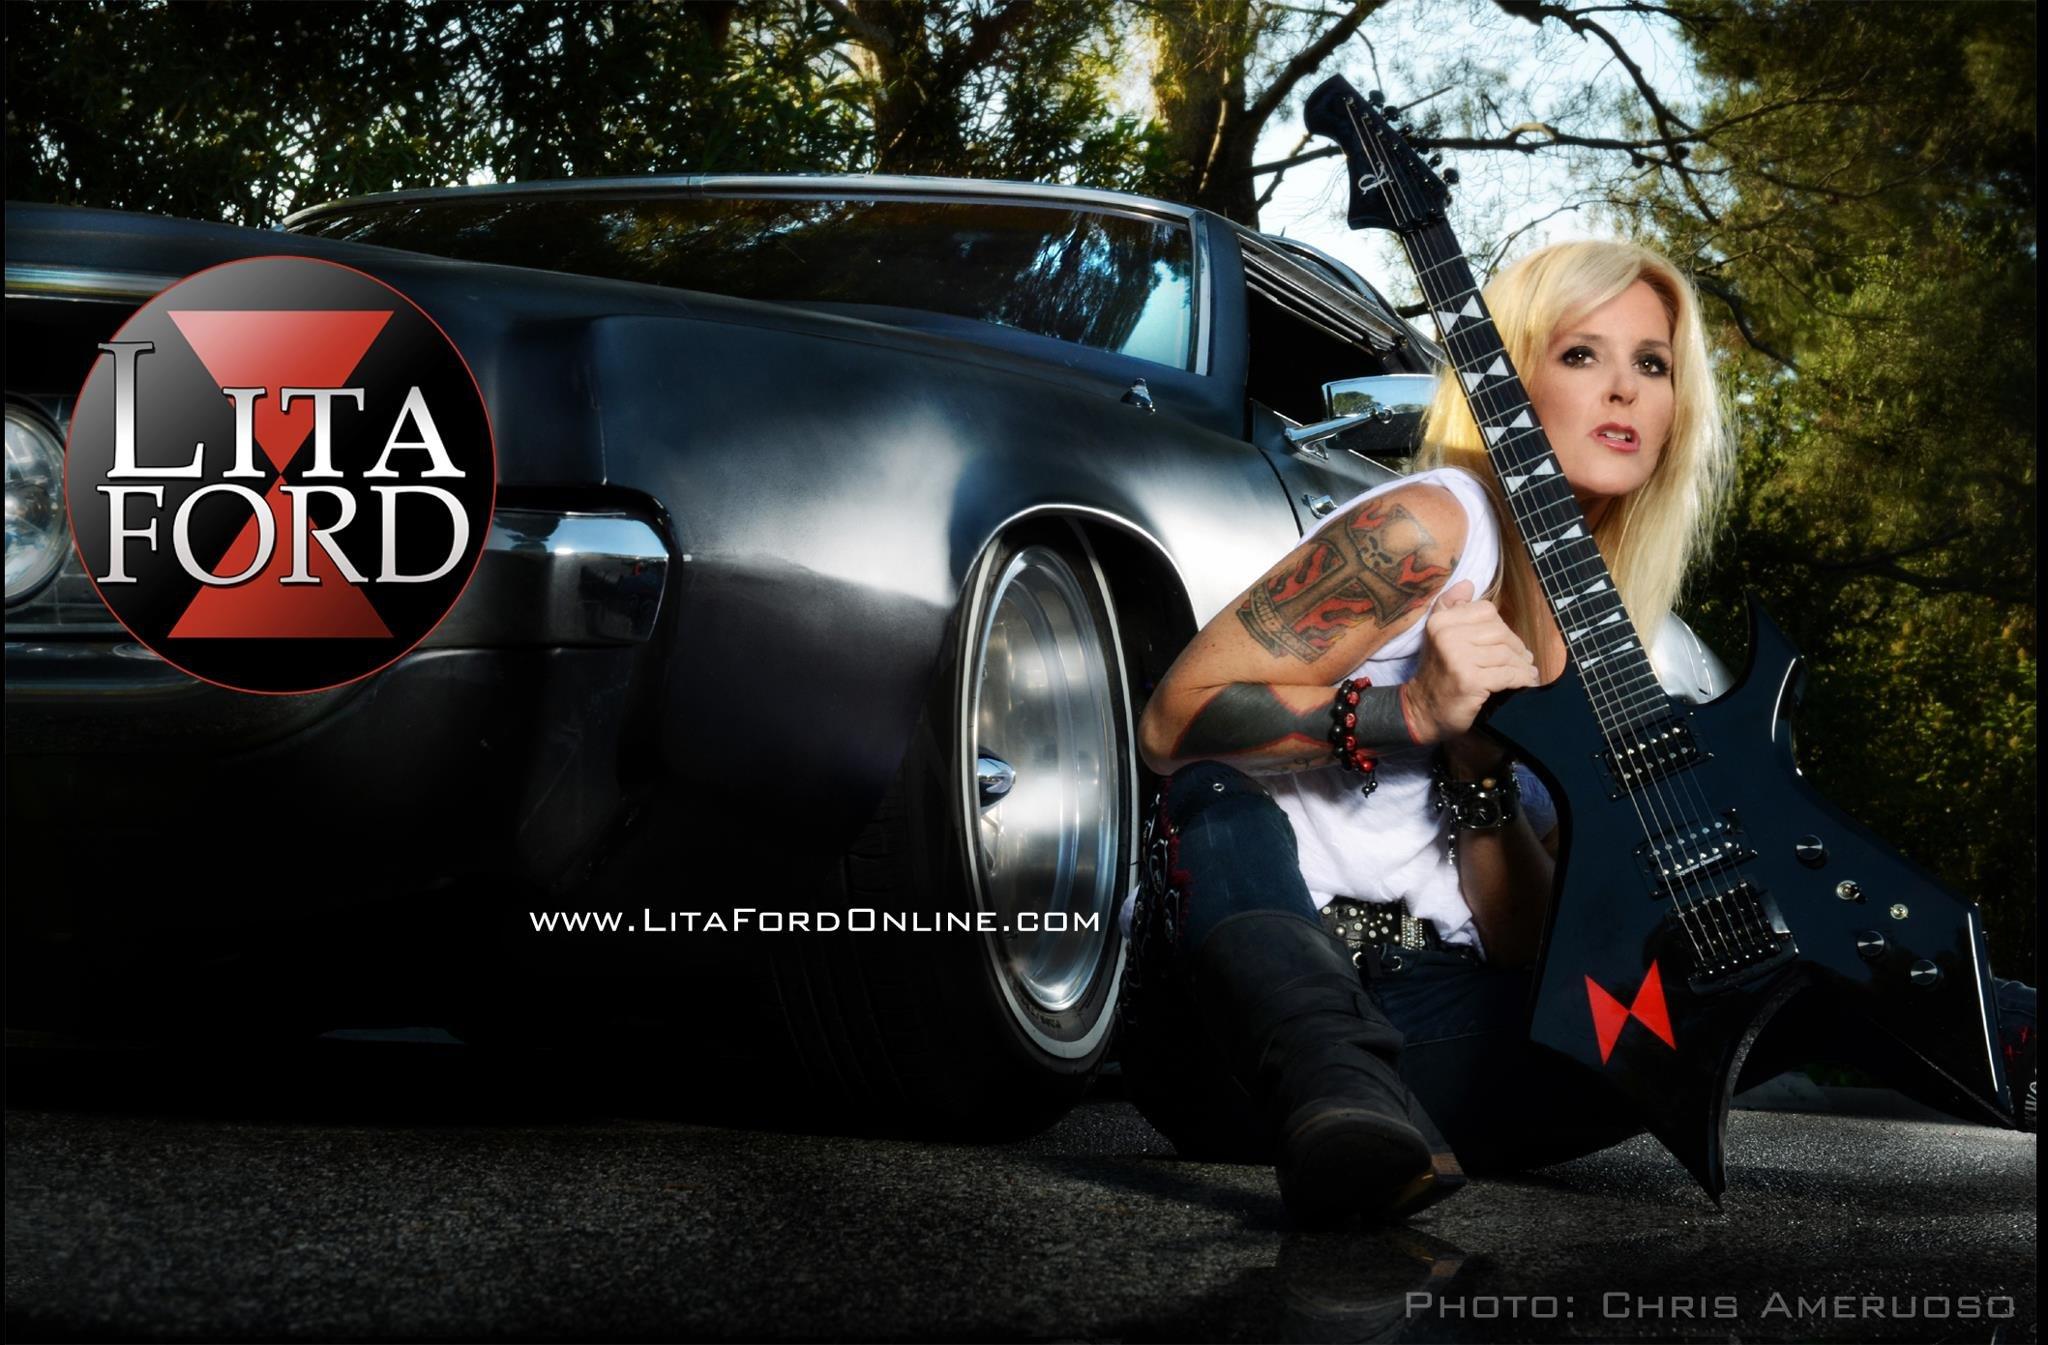 LITA FORD heavy metal hard rock babe poster guitar ...